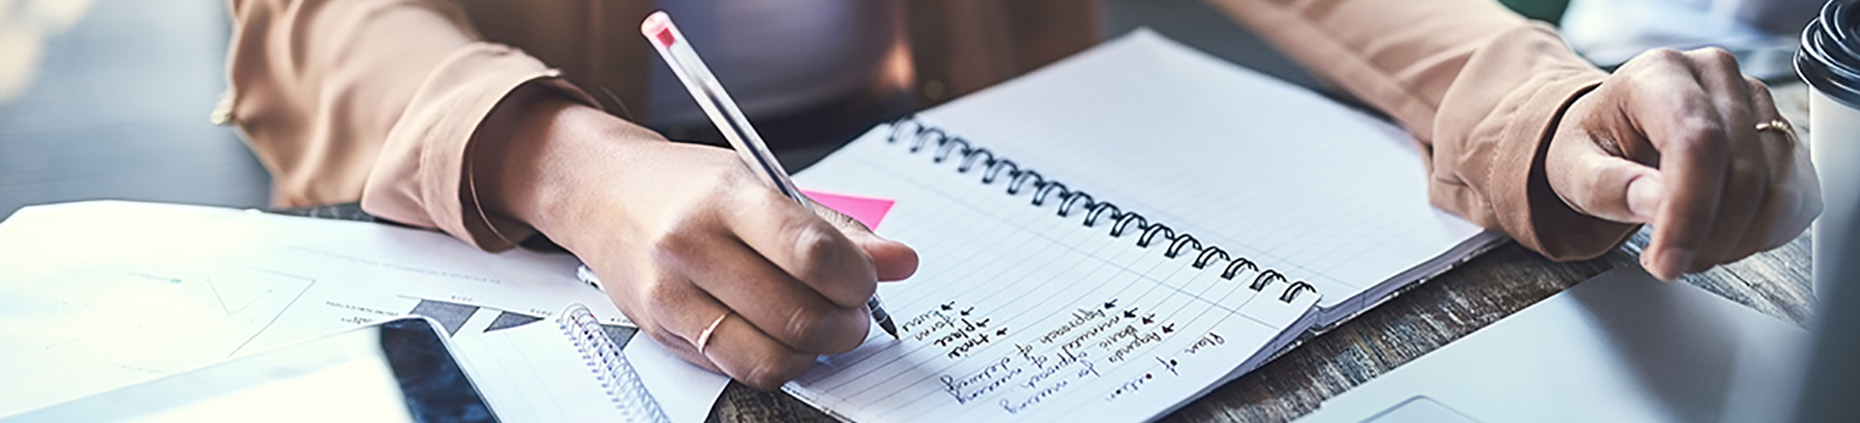 [On-Demand Webinar] 9 Habits of Extreme Sales Productivity